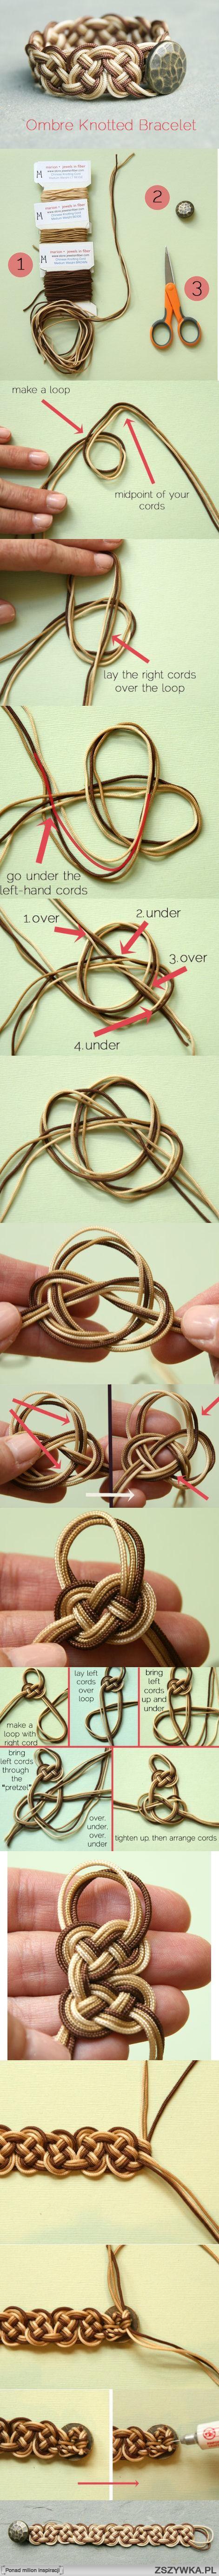 How to DIY Ombre Celtic Knot Bracelet